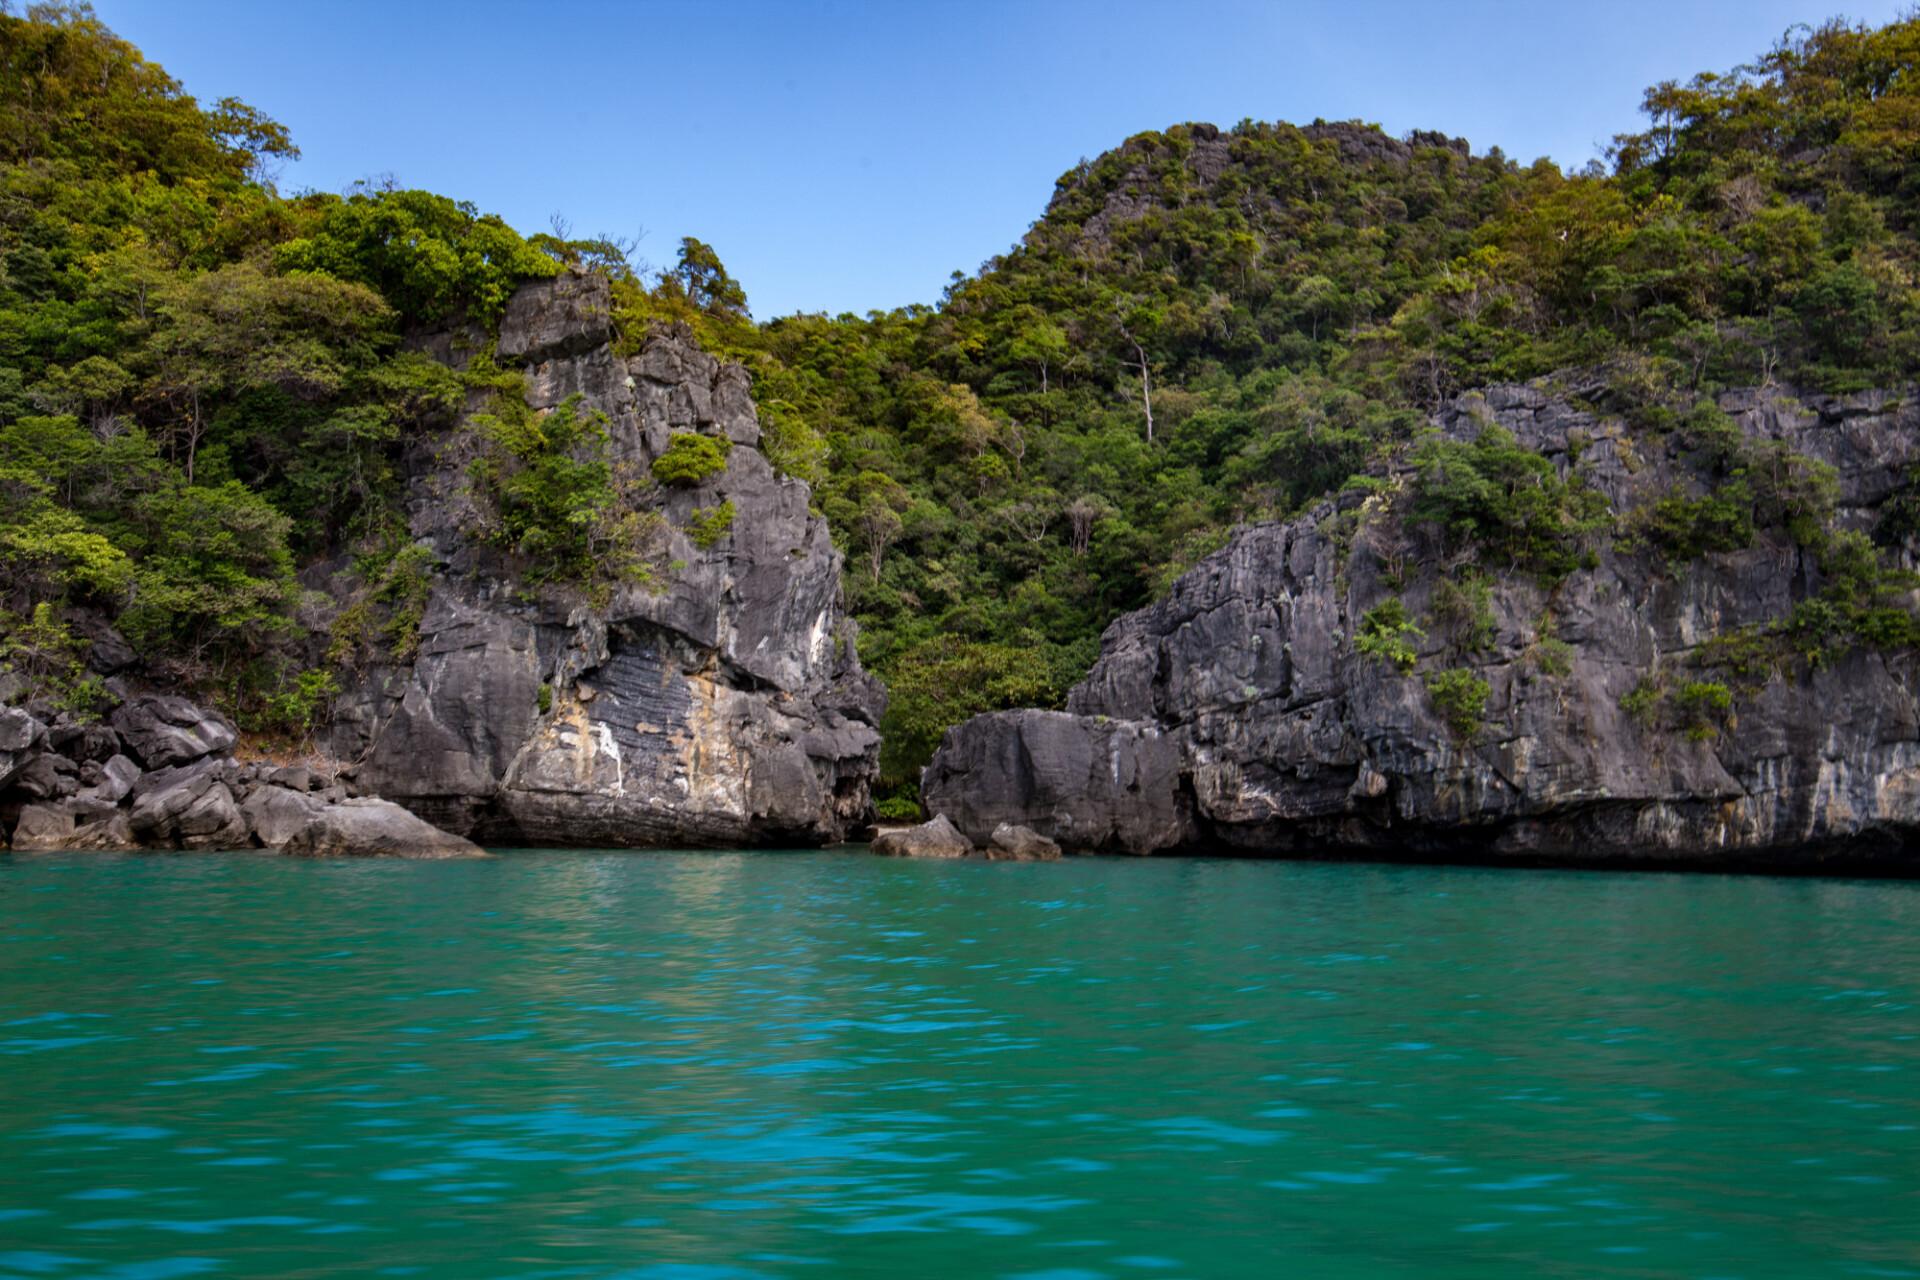 cliffs at the sea